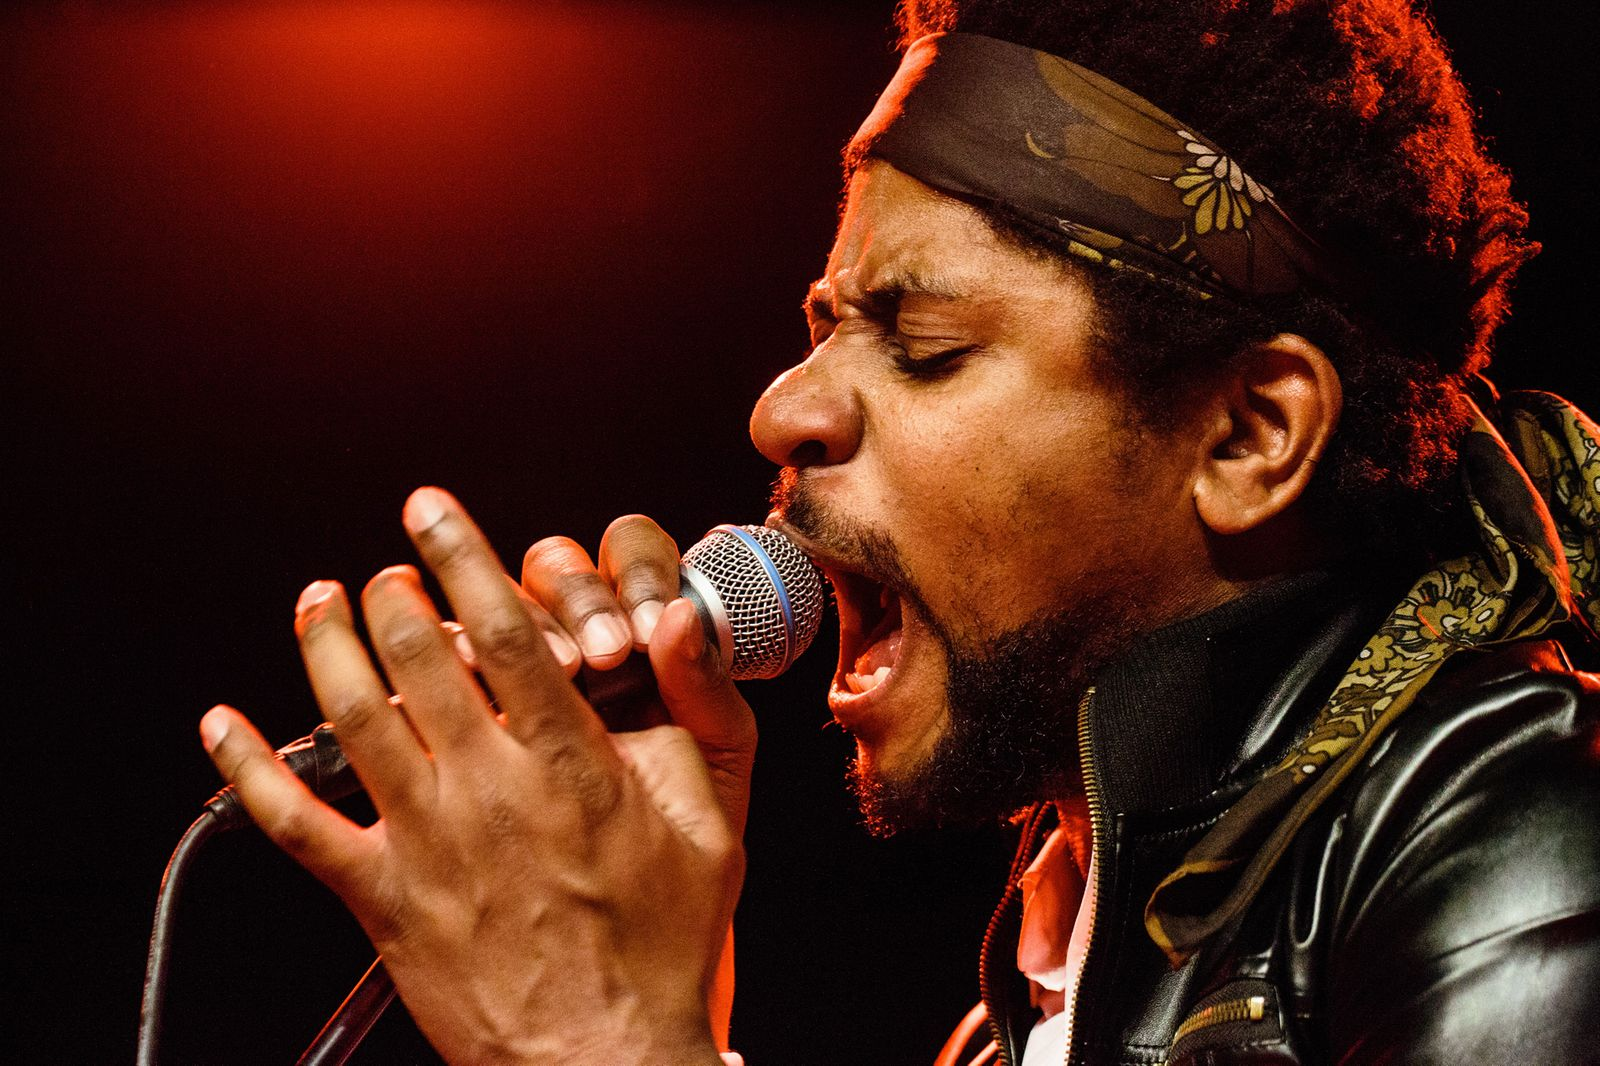 Algiers live in Copenhagen, Denmark.